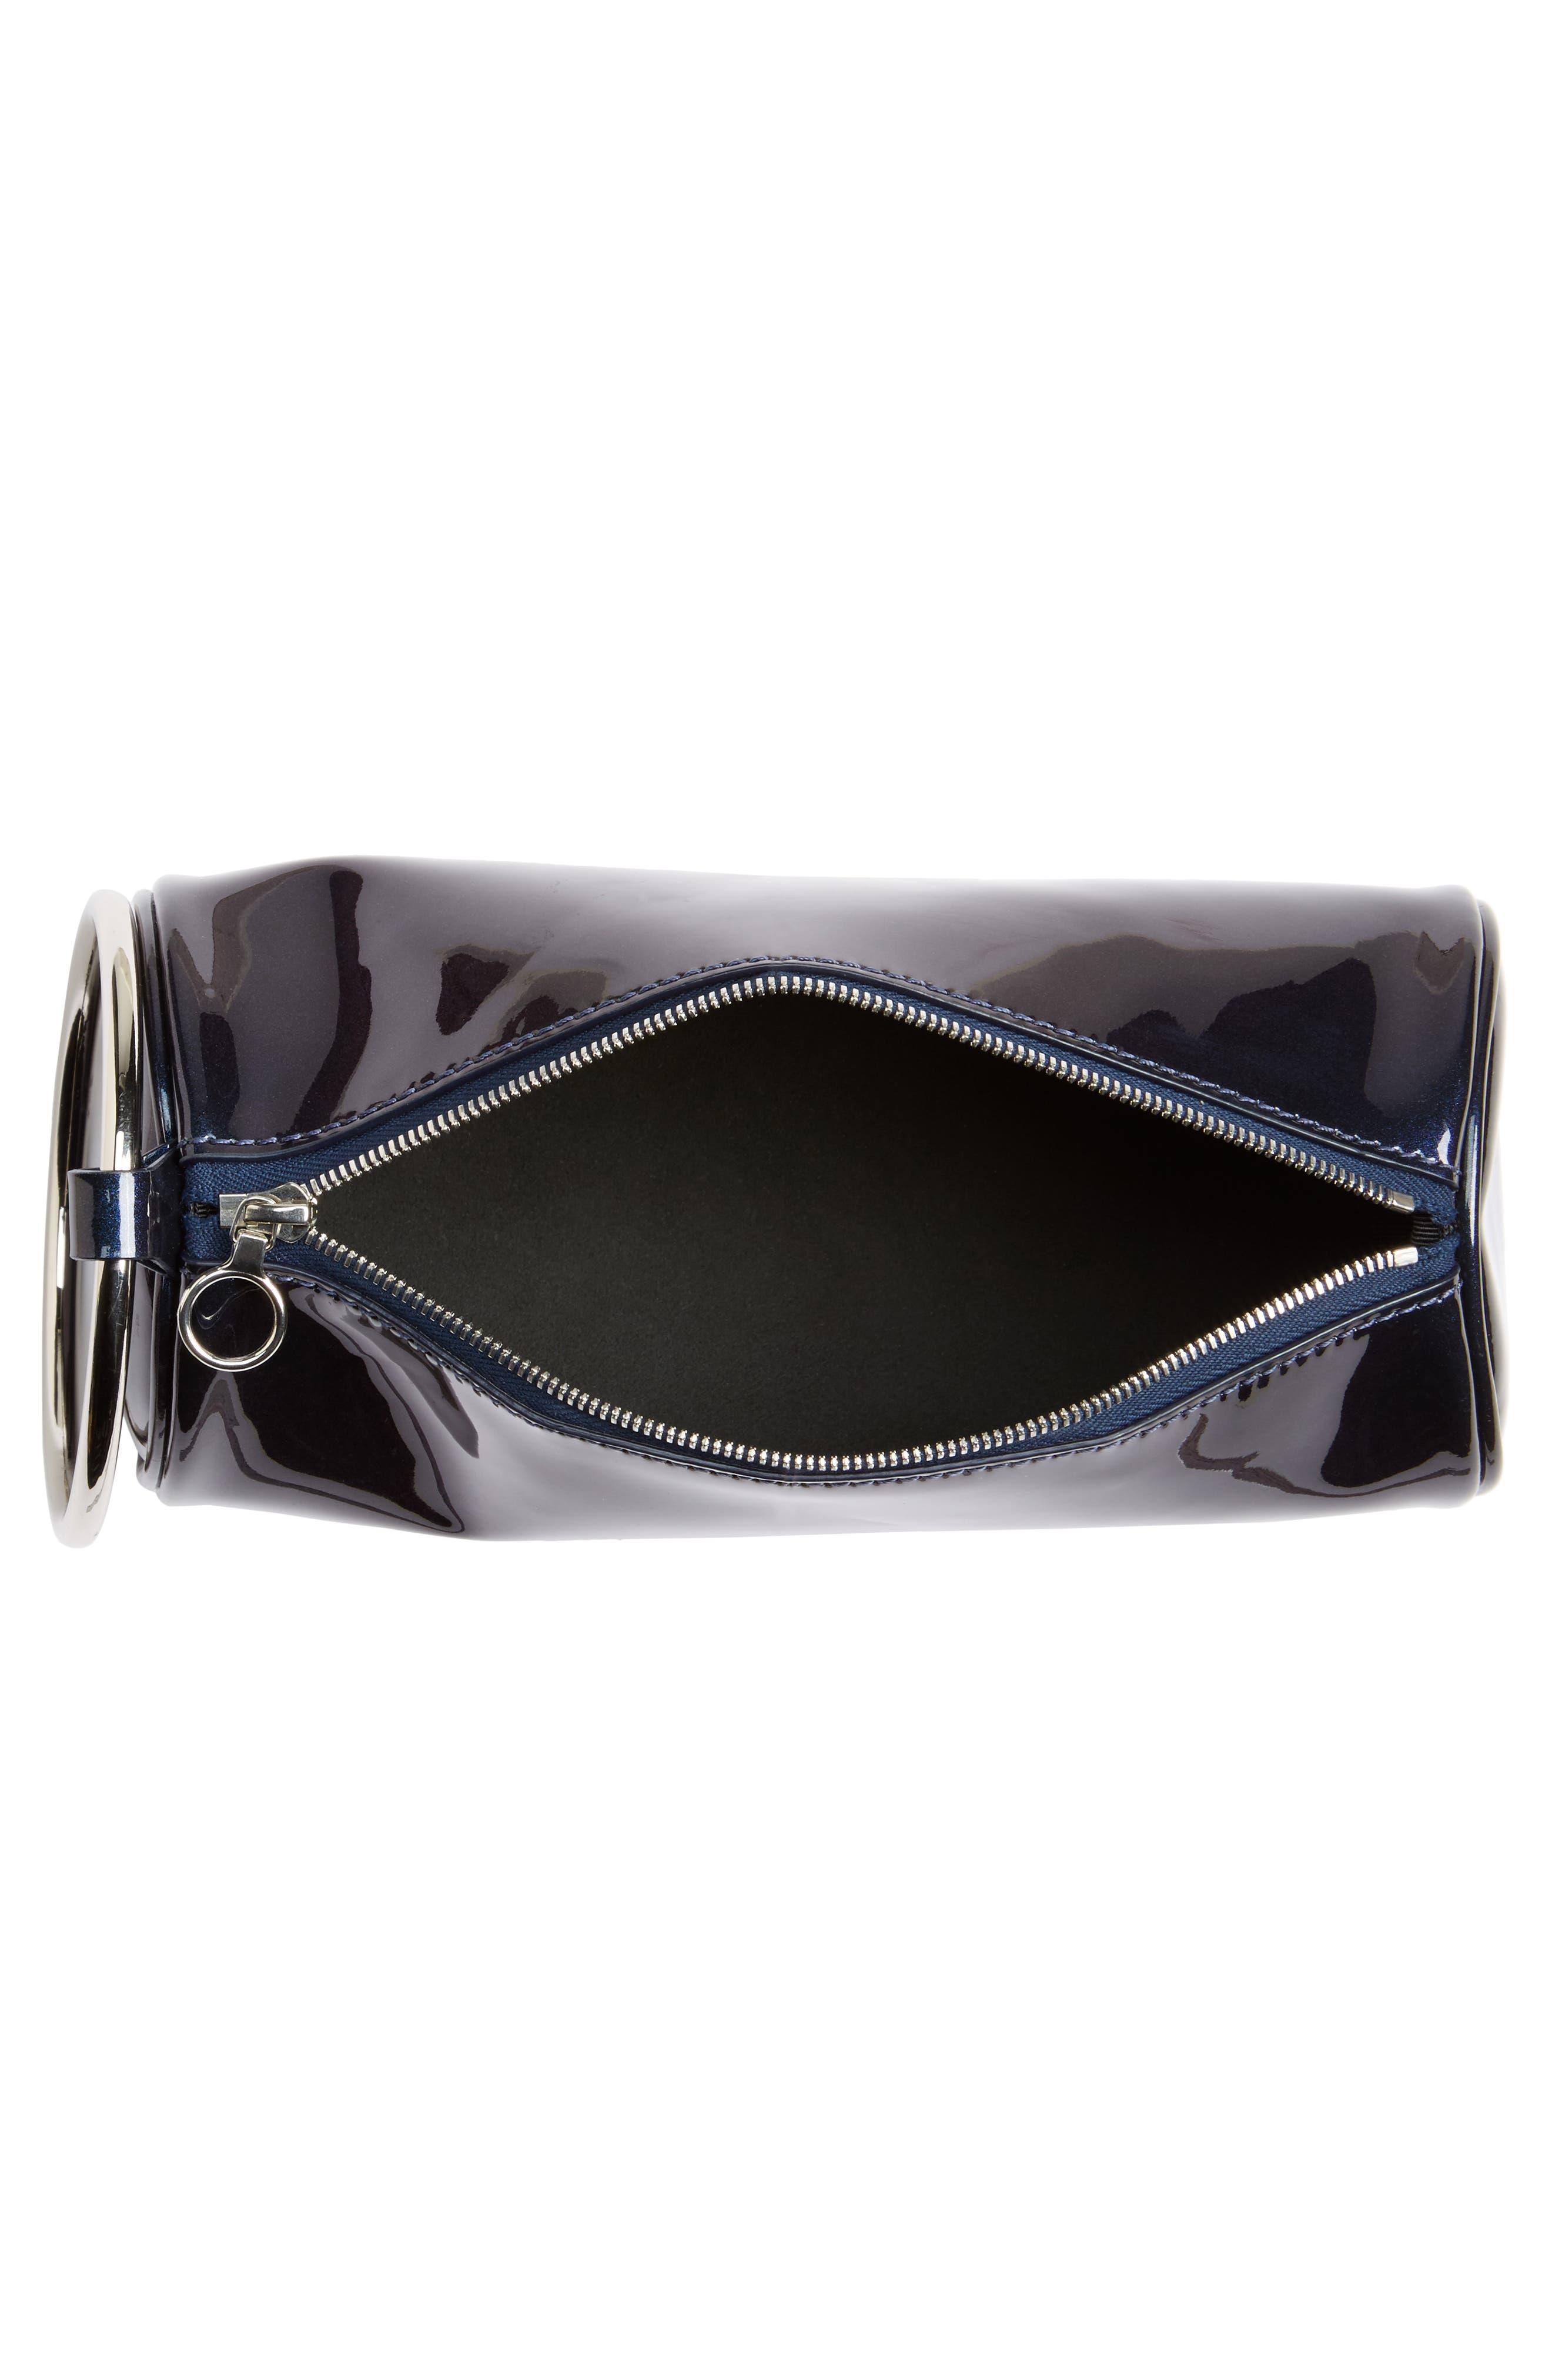 Iridescent Leather Duffel Wristlet Clutch,                             Alternate thumbnail 4, color,